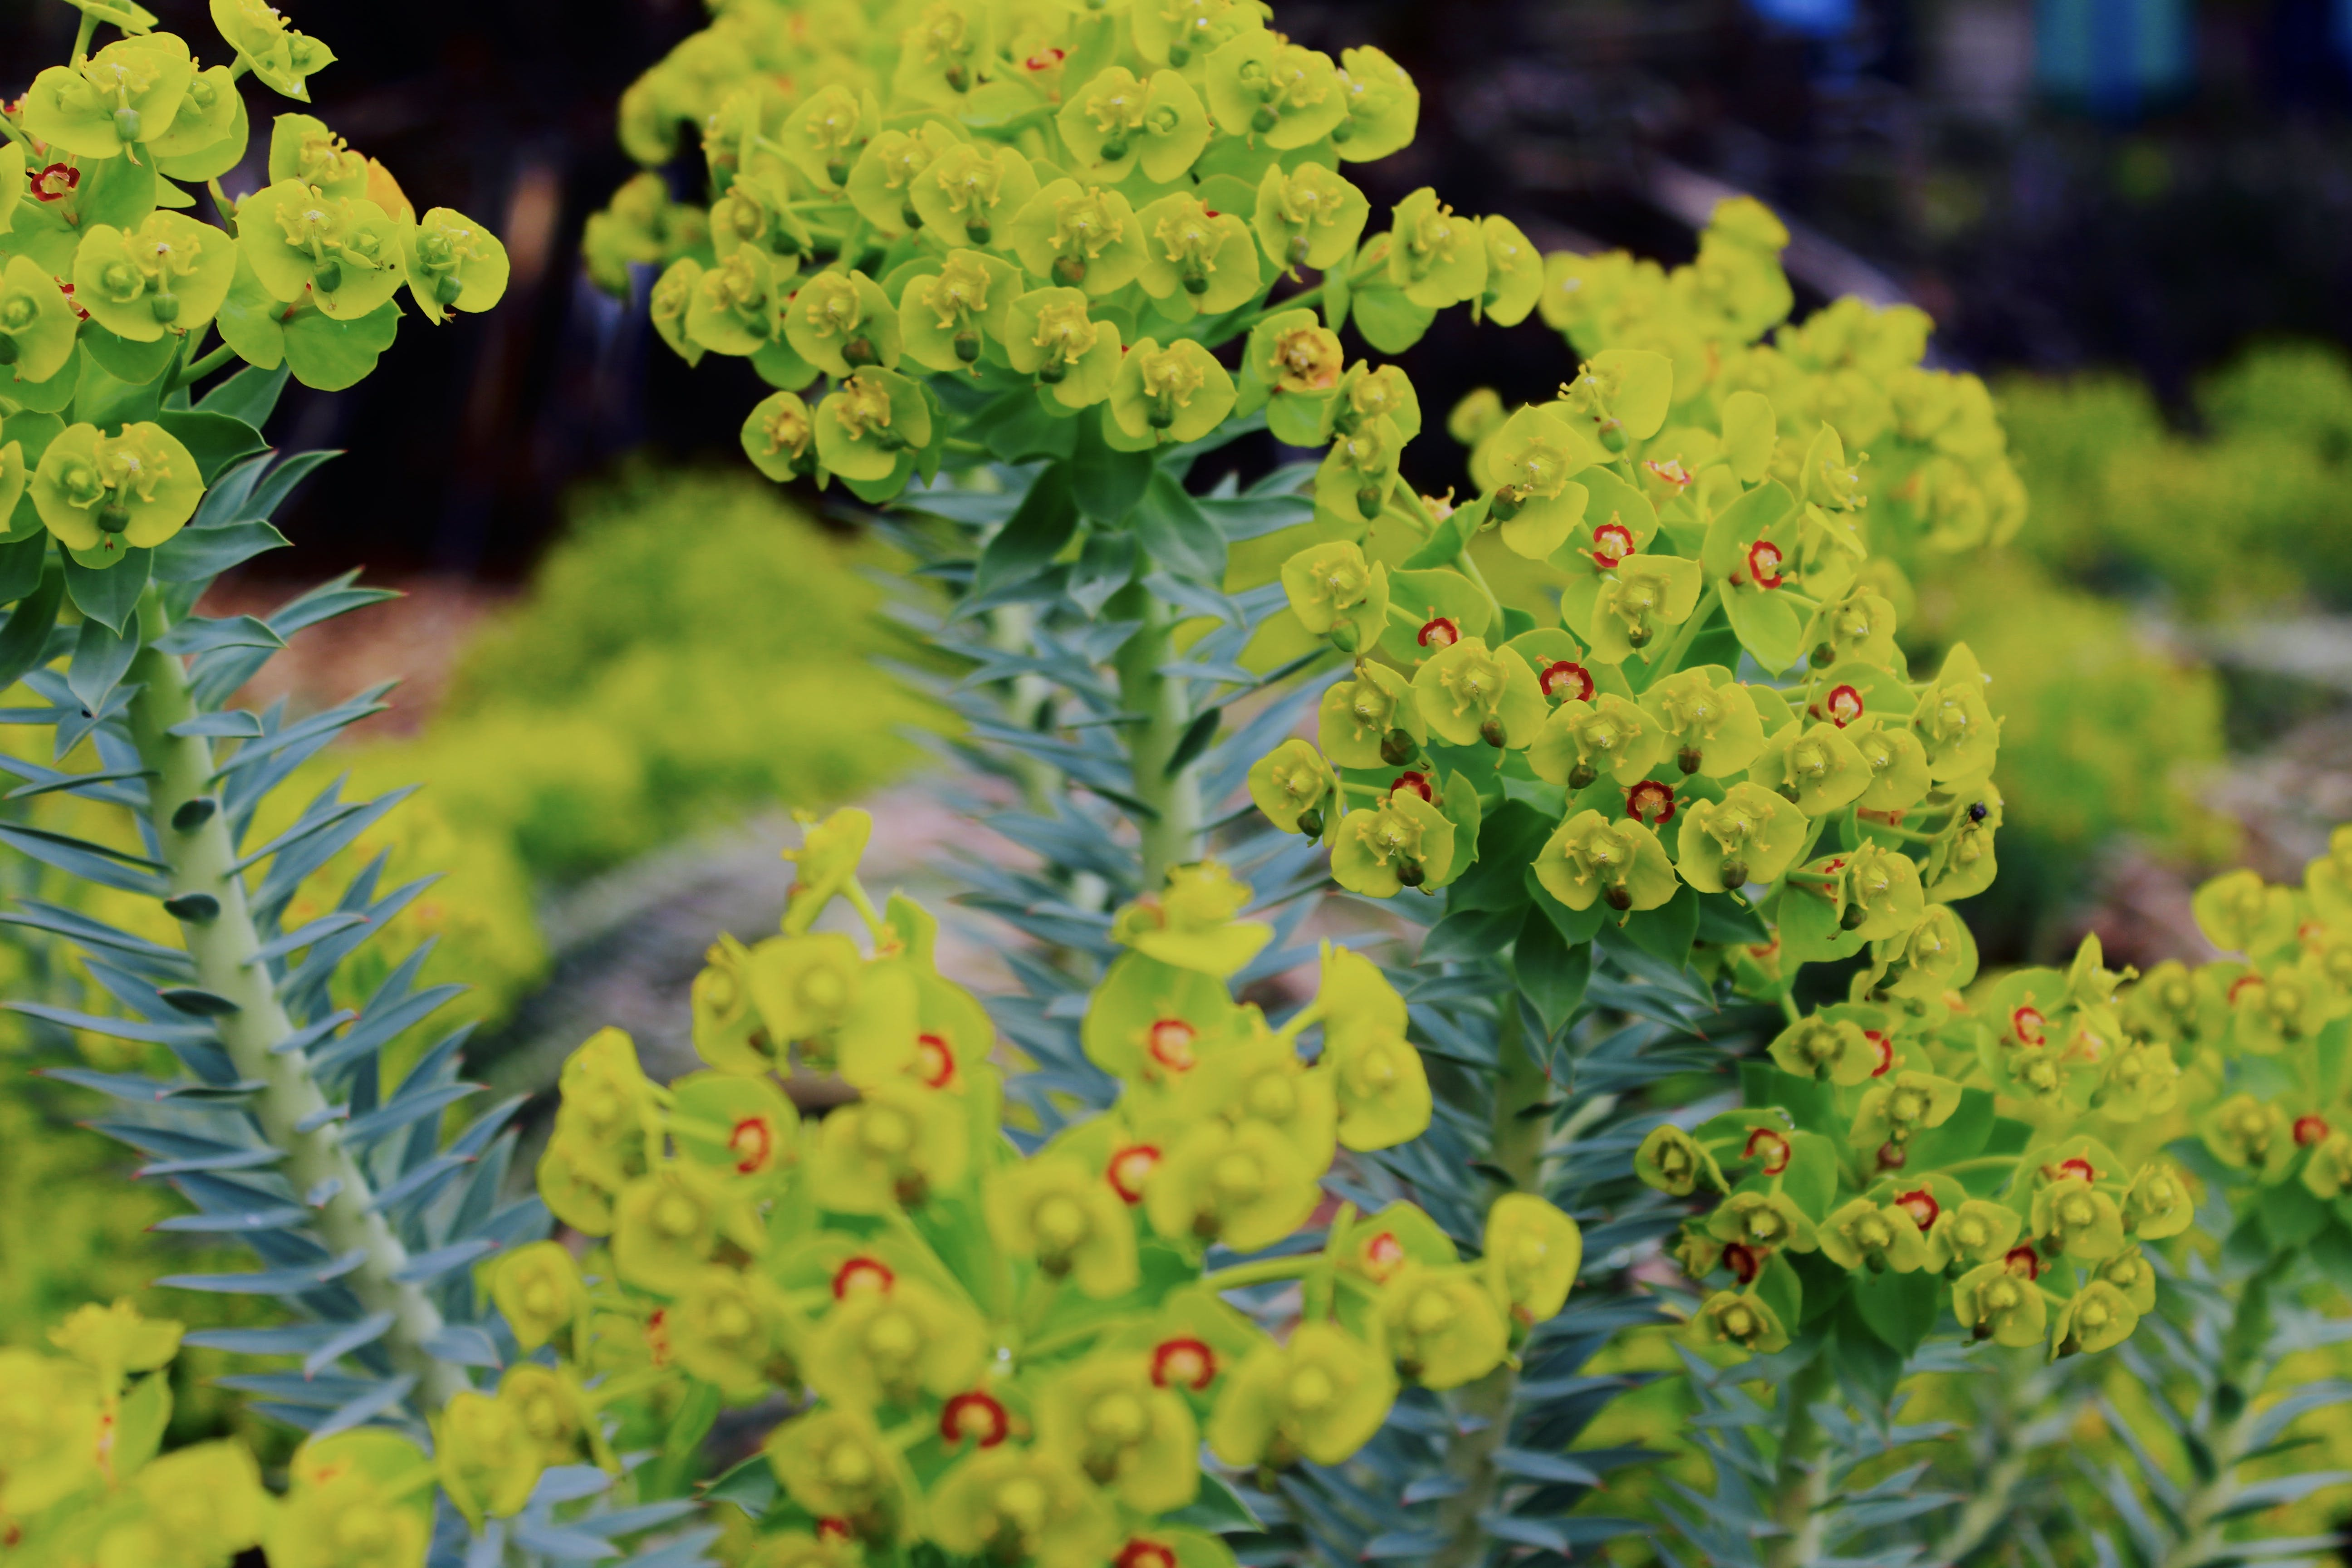 Selective Focus Photography Green Euphorbia Milii Flowers